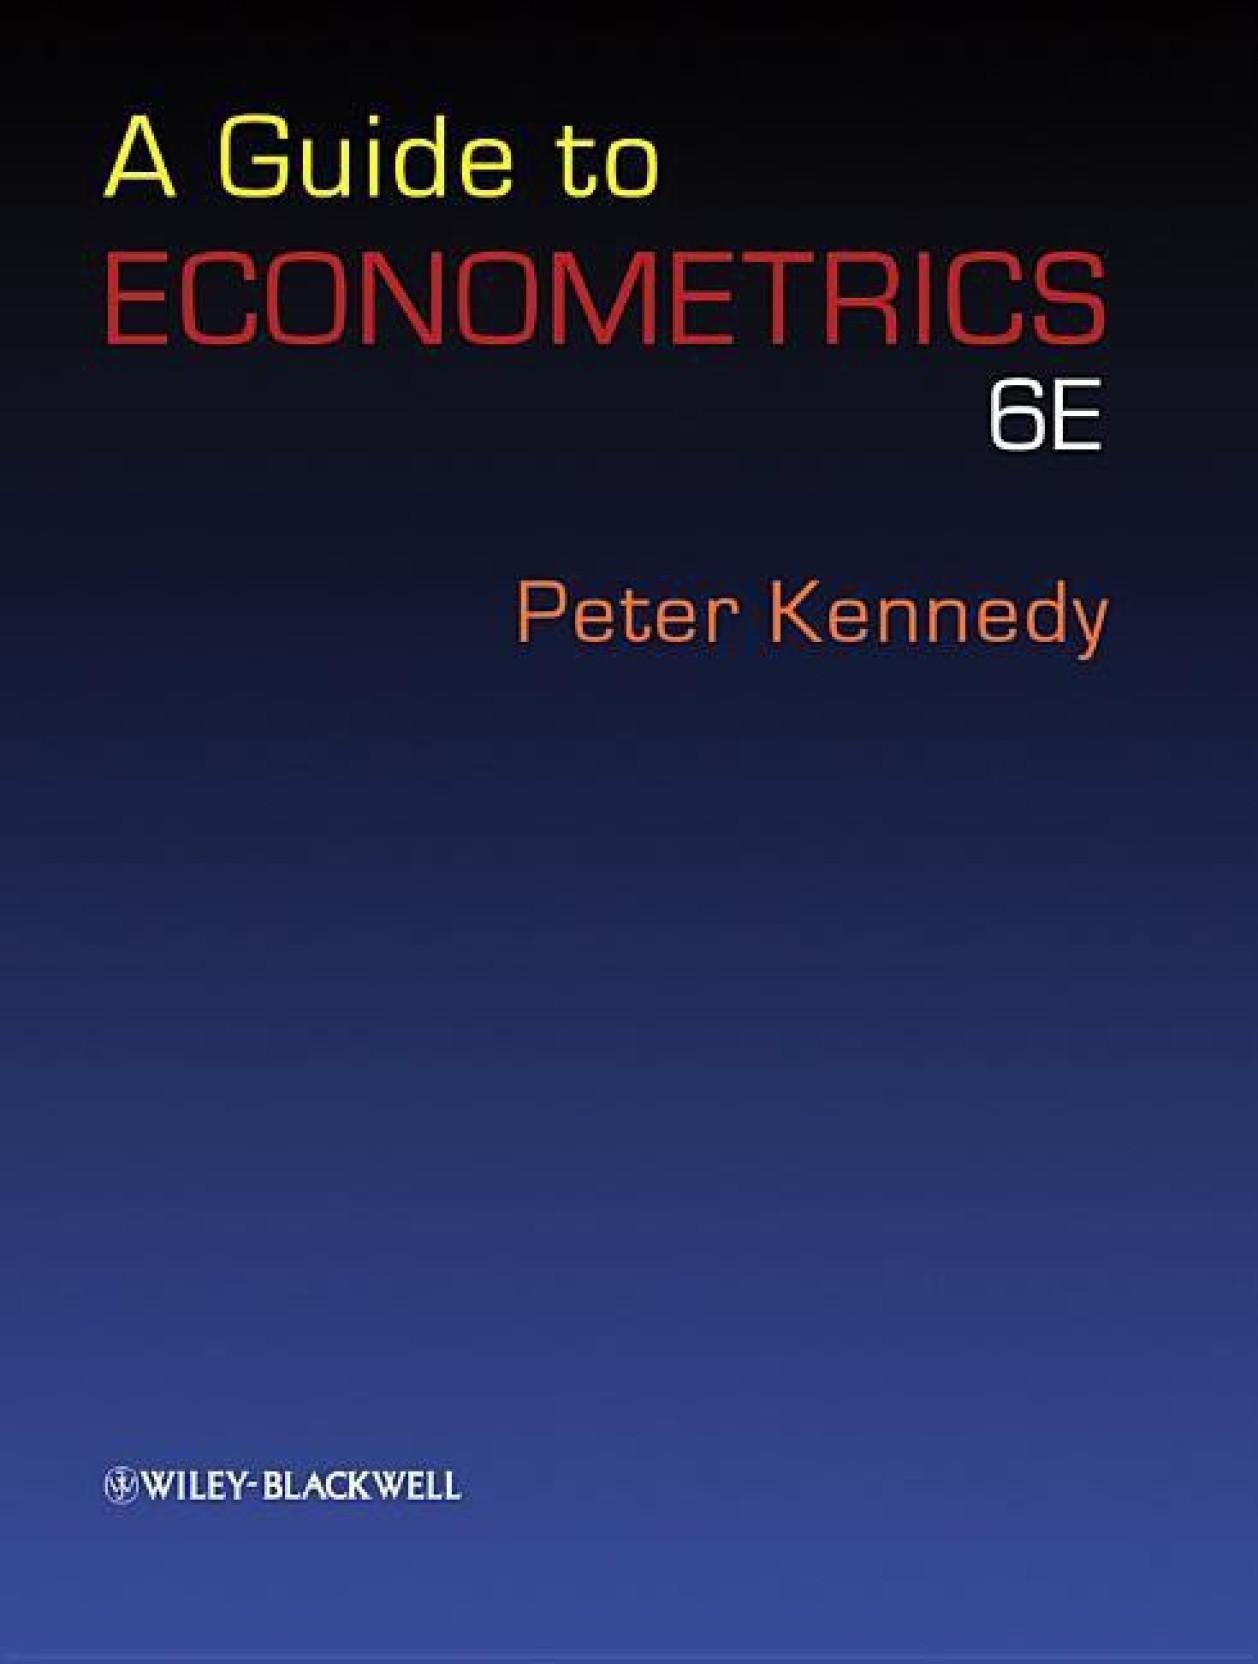 A Guide to Econometrics. ADD TO CART